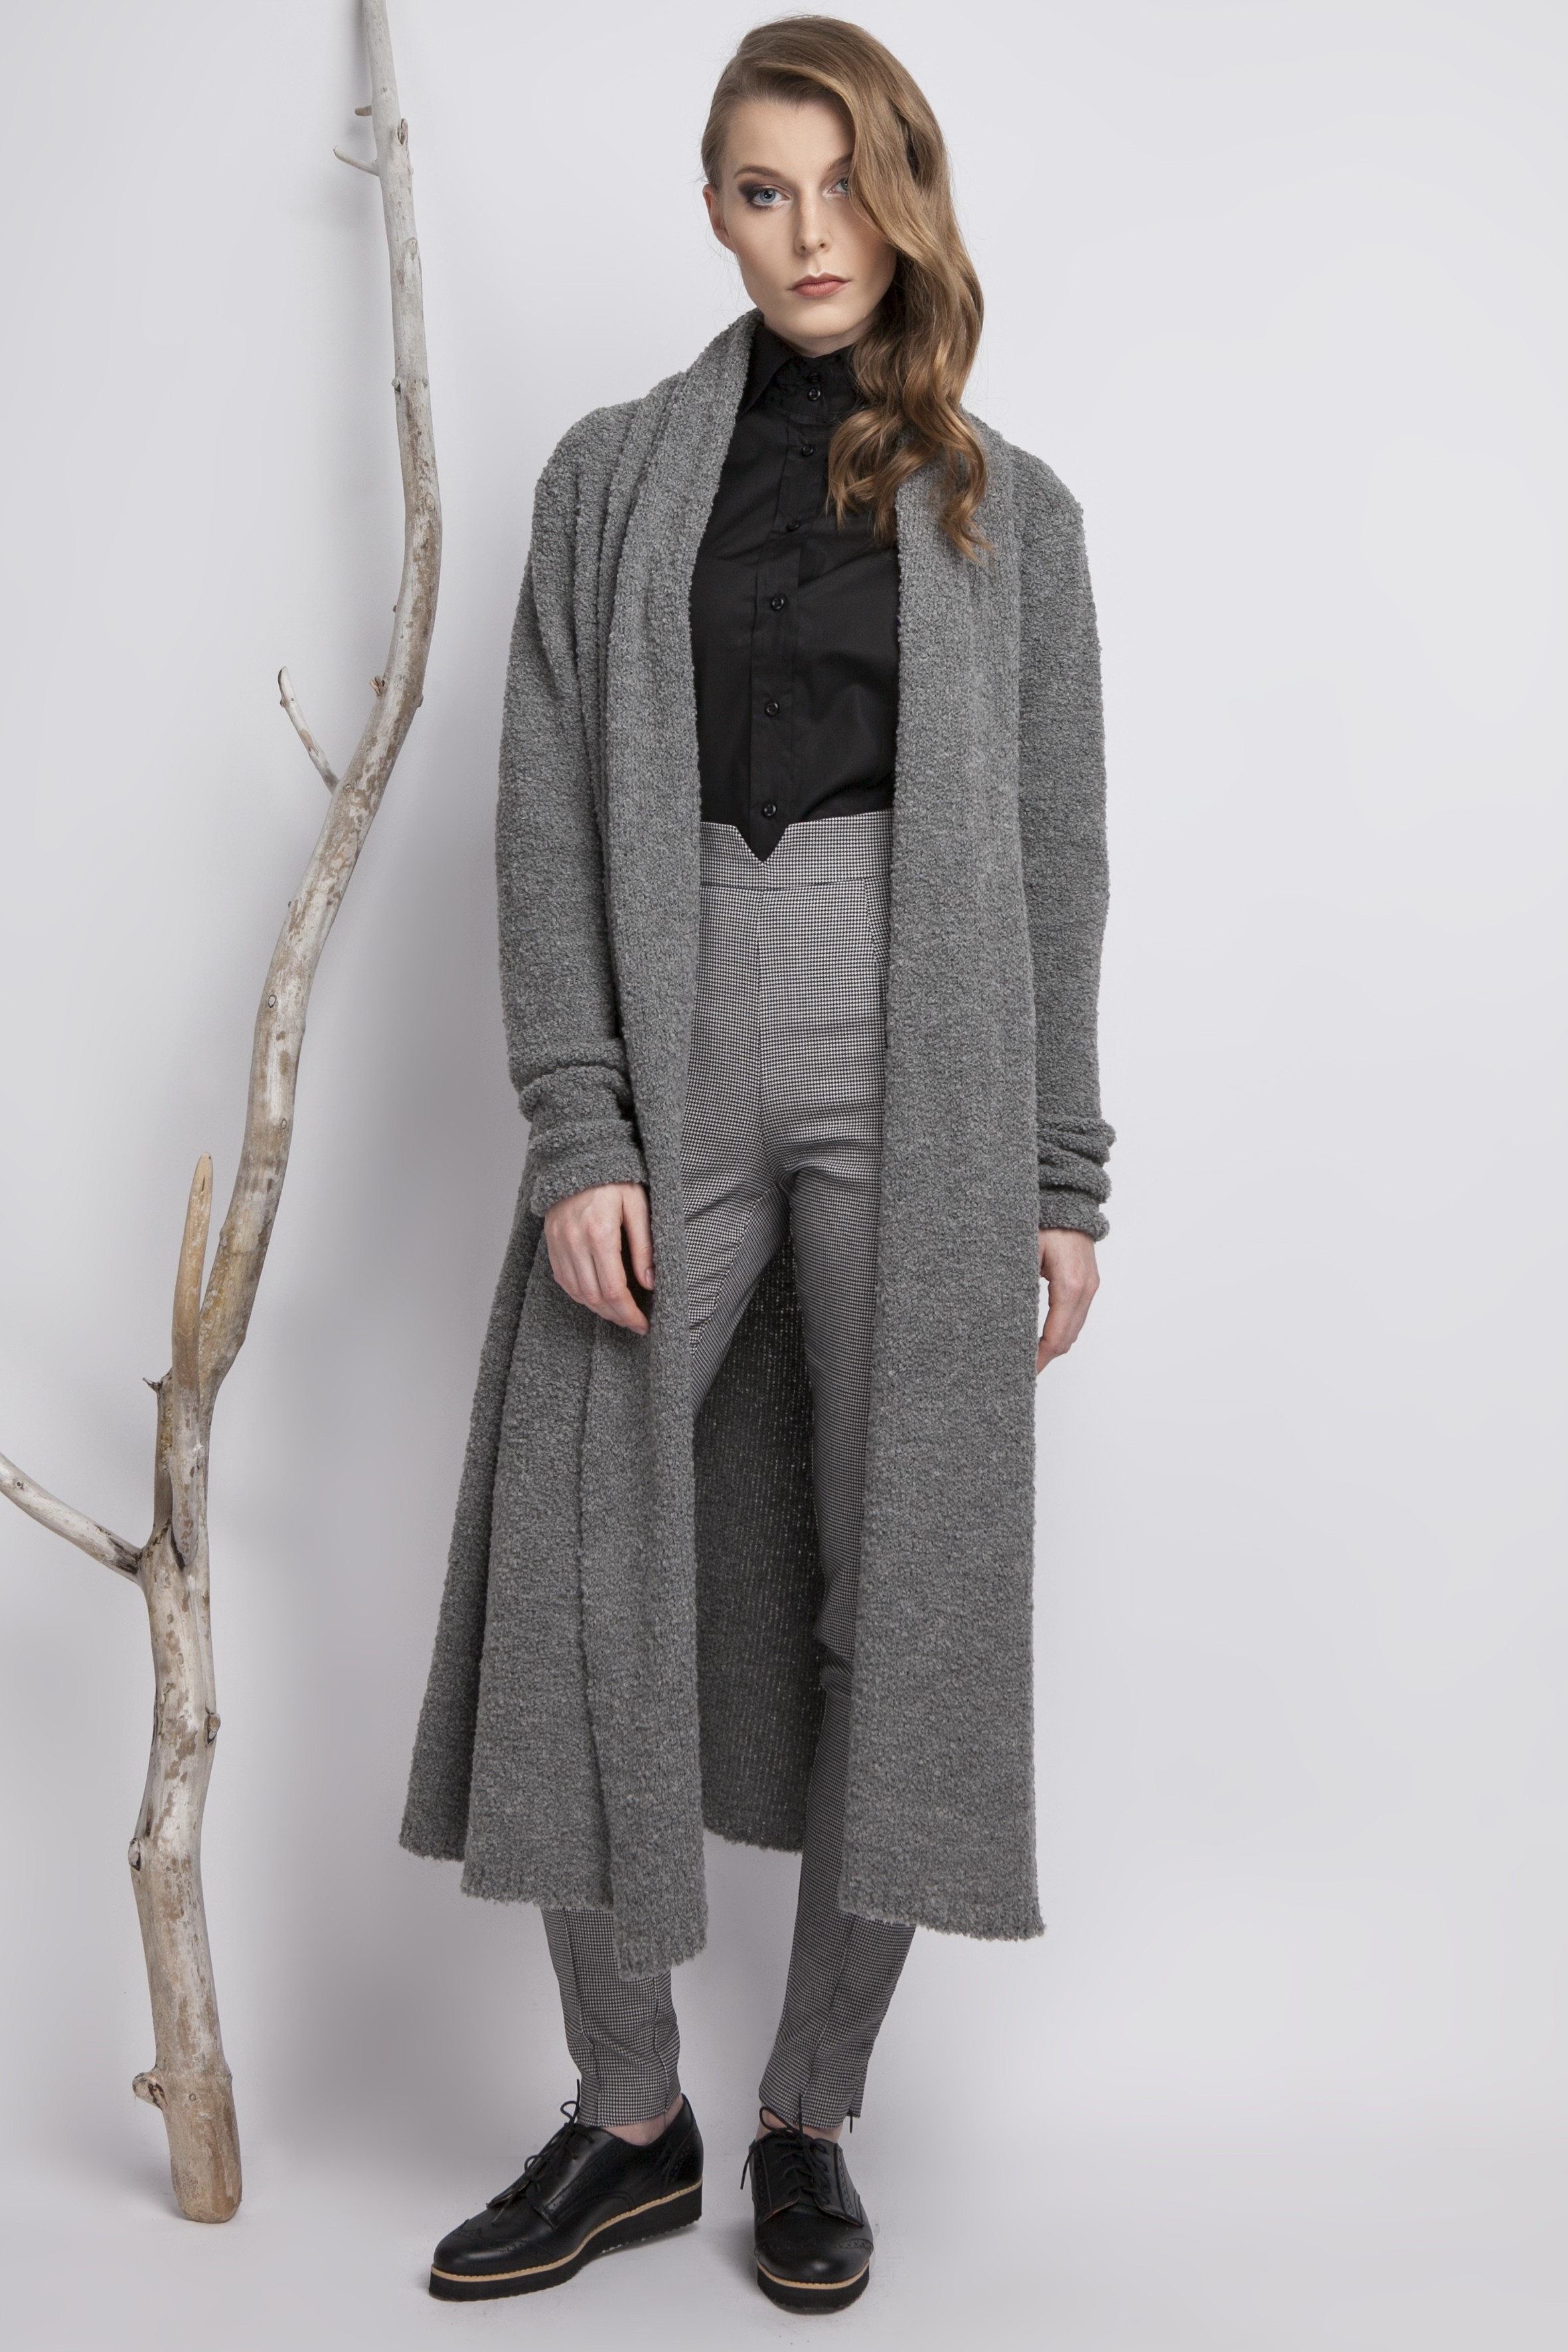 Thumb Hole Sweater | Thumbhole Sweater | Long Sleeve Tops with Thumb Holes